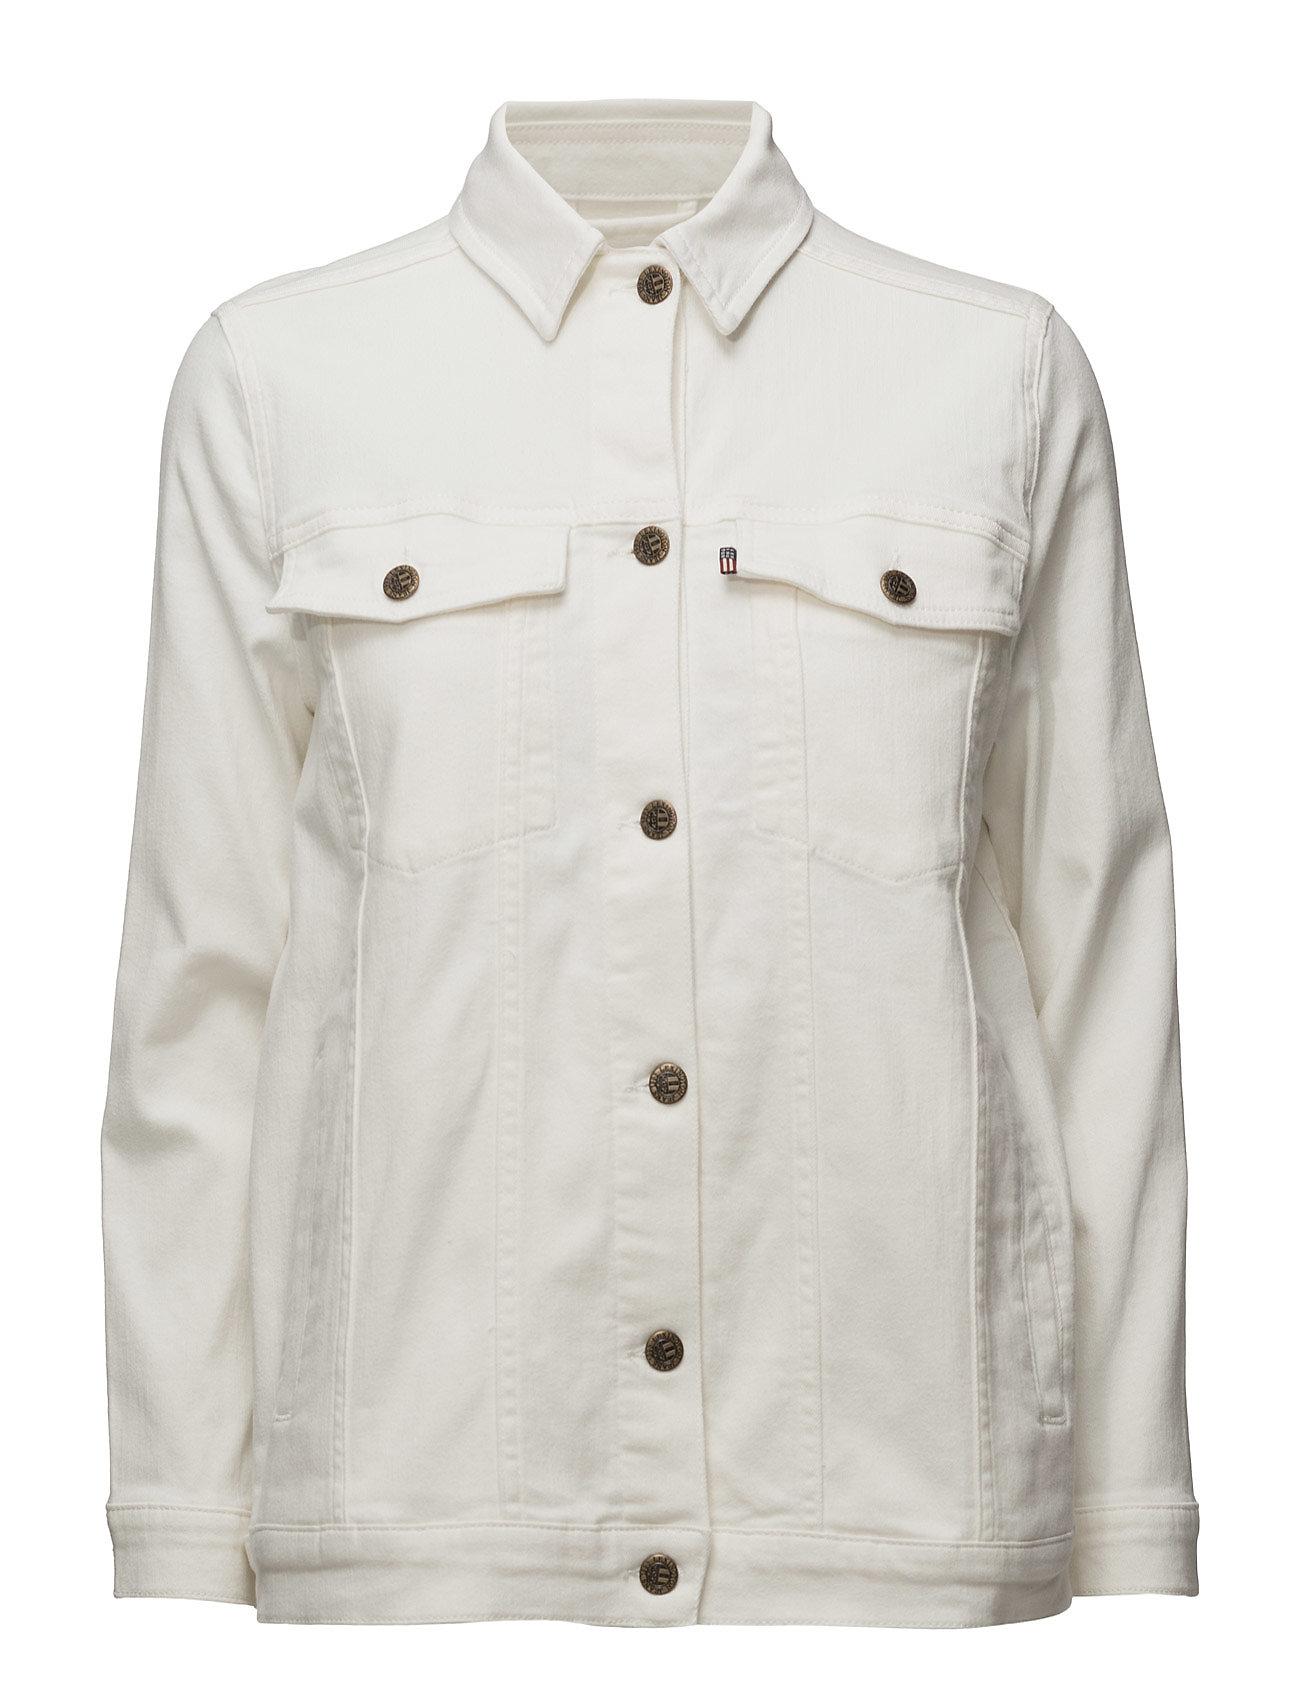 Pearl Denim Jacket Lexington Company Jakker til Kvinder i Sne hvid